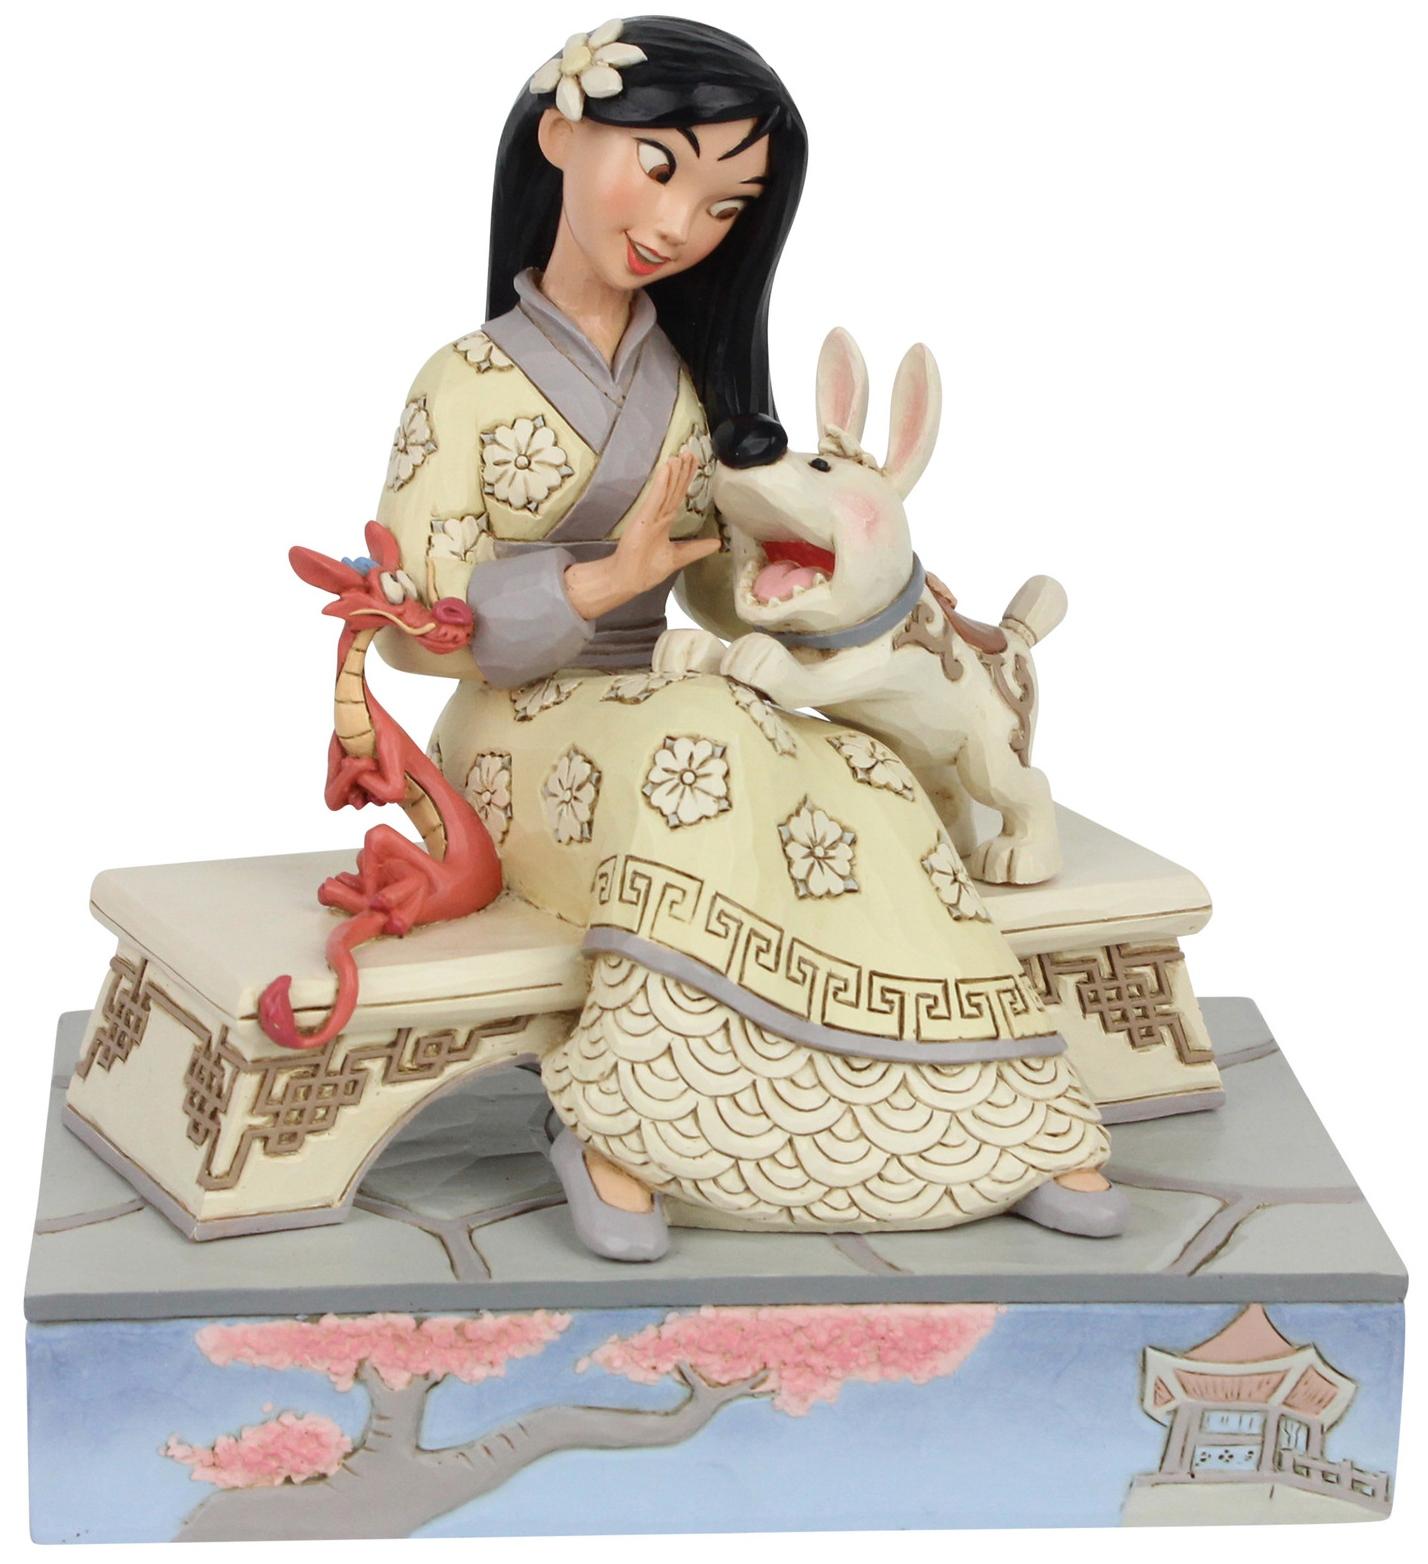 Disney Traditions by Jim Shore 6007061 White Woodland Mulan Figurine